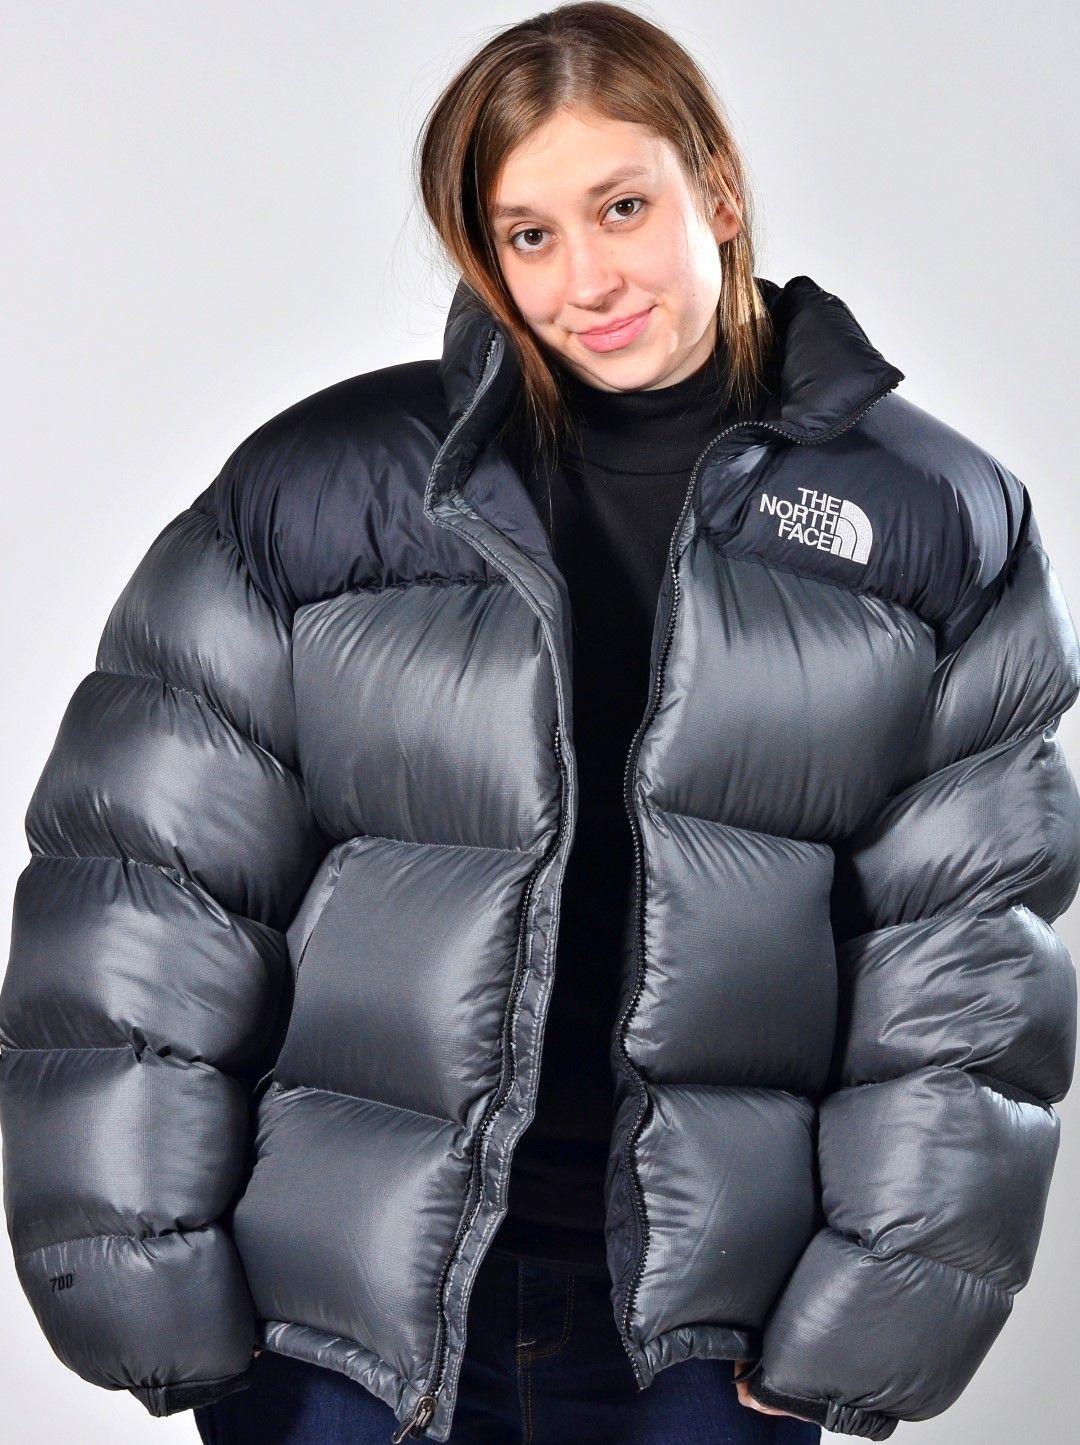 e18c3f8b6f4 Over-Stuffed Puffy Jackets